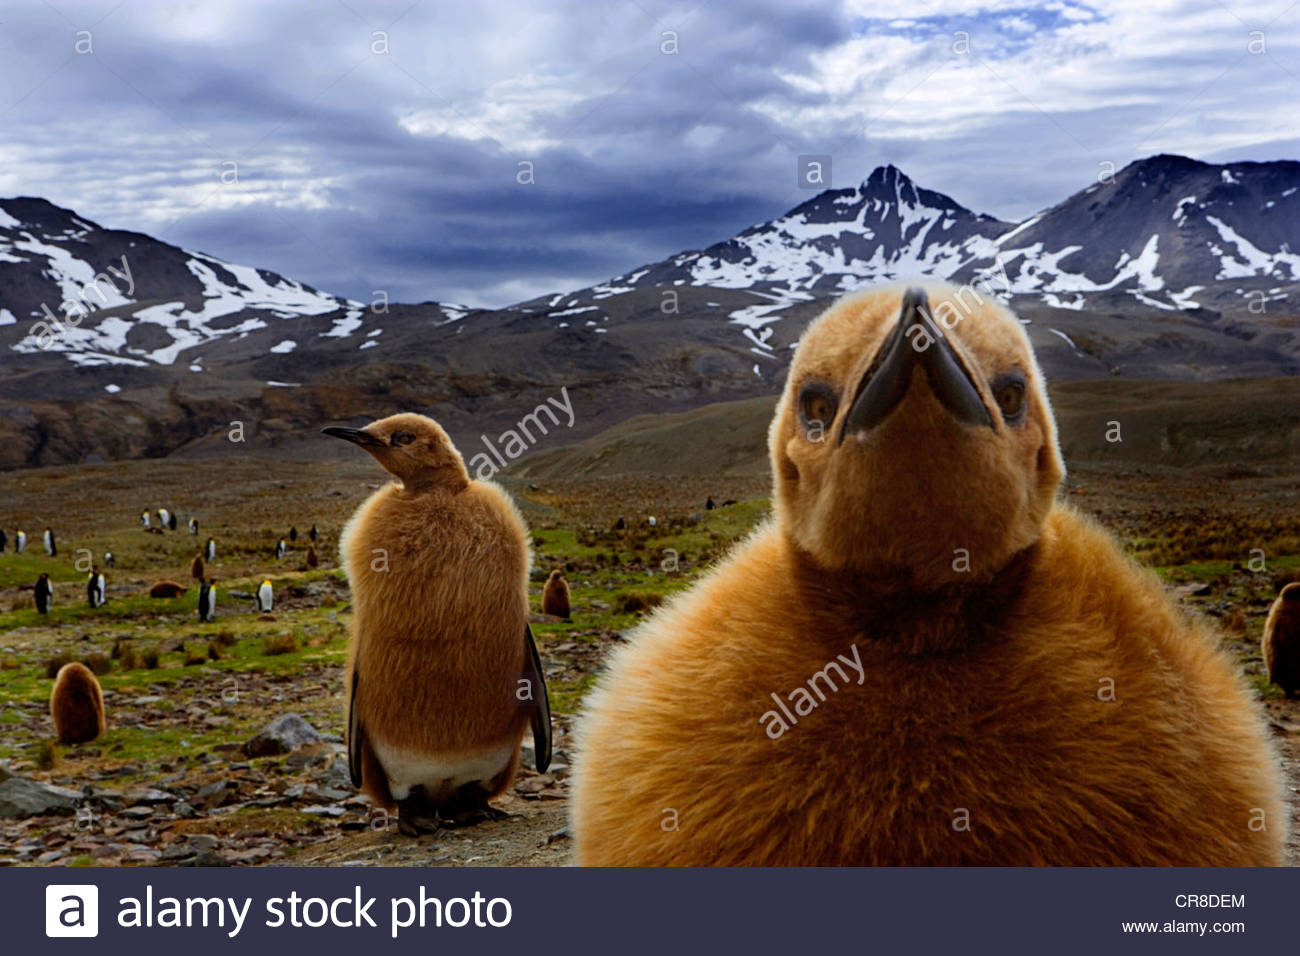 King Penguin chicks, South Georgia Island, UK - Stock Image